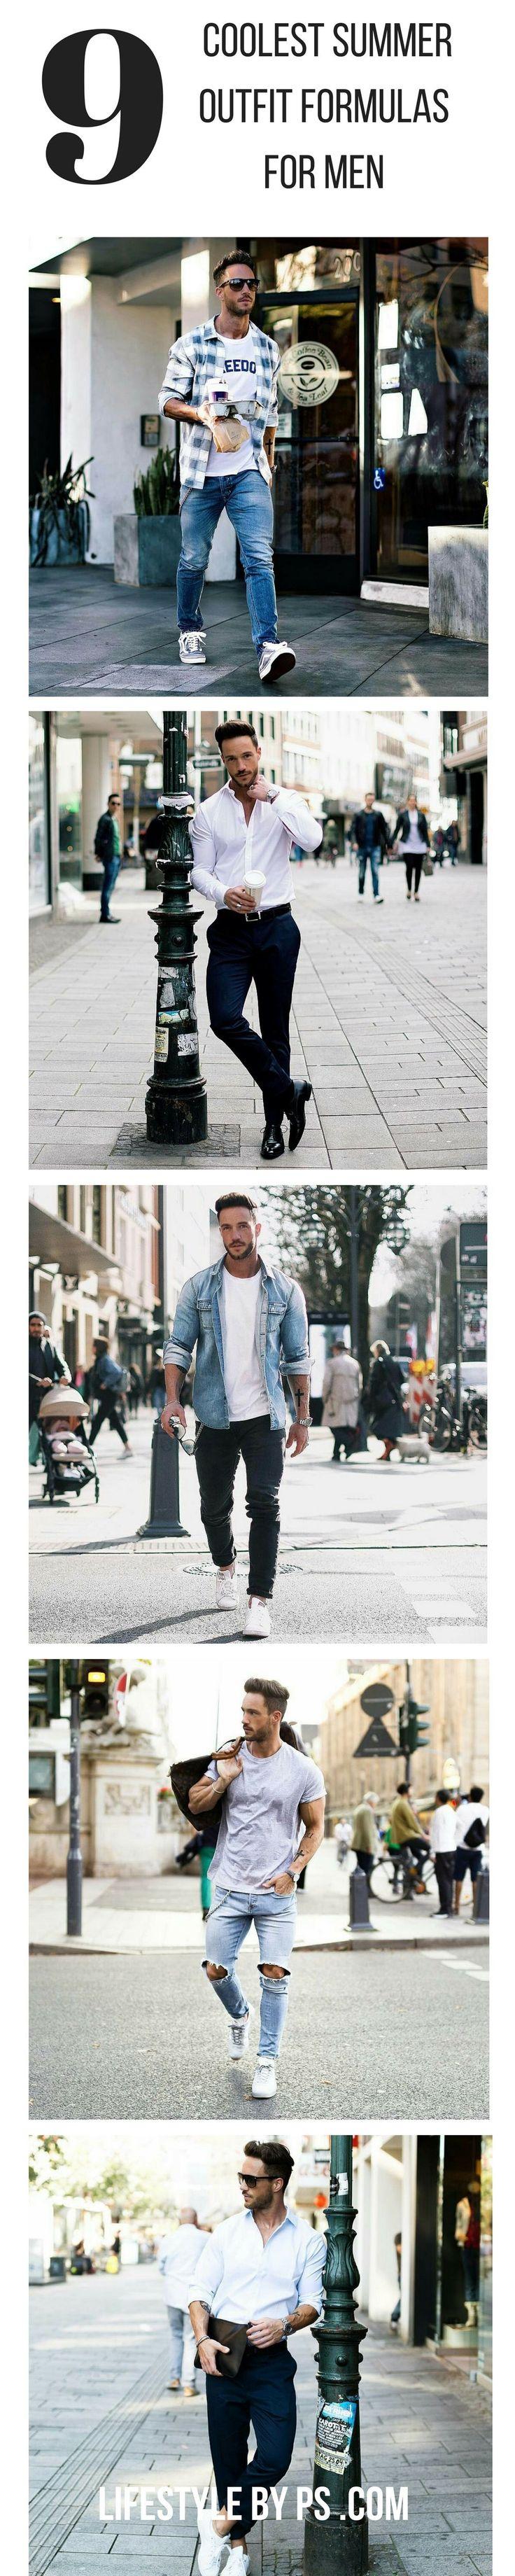 Coolest Summer Outfit Formulas For Men.